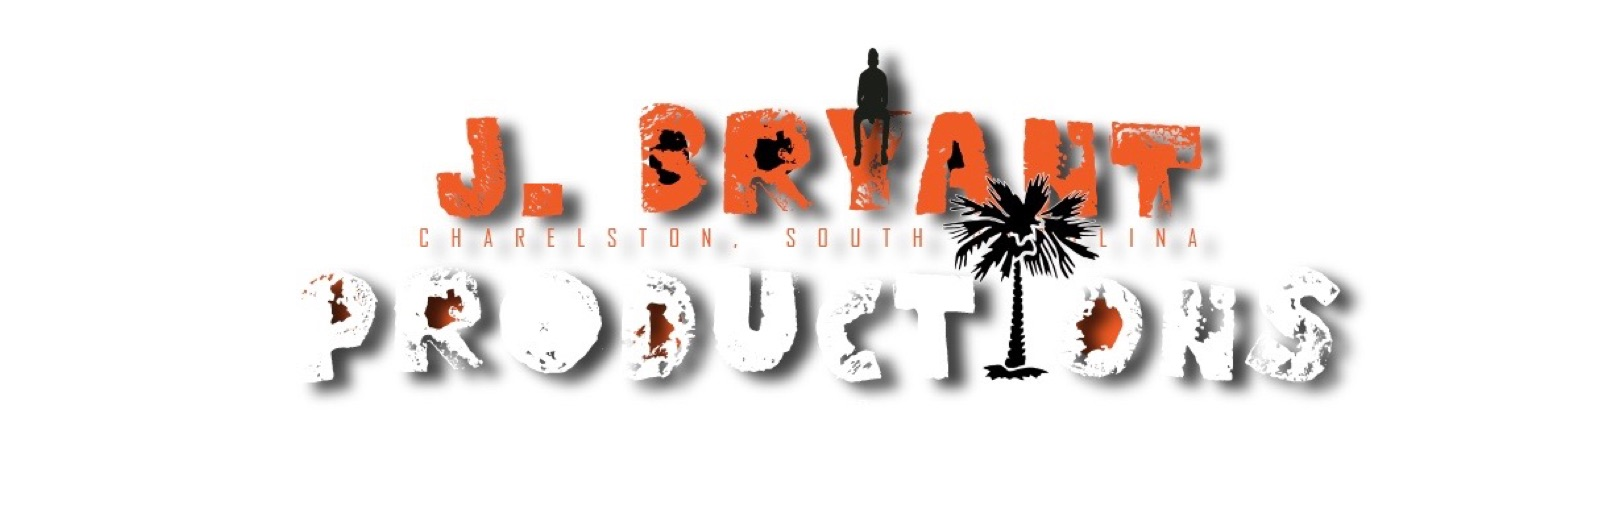 https://www.lcoutlaws7v7.com/wp-content/uploads/sites/3/2020/09/J-BRYANT.jpg